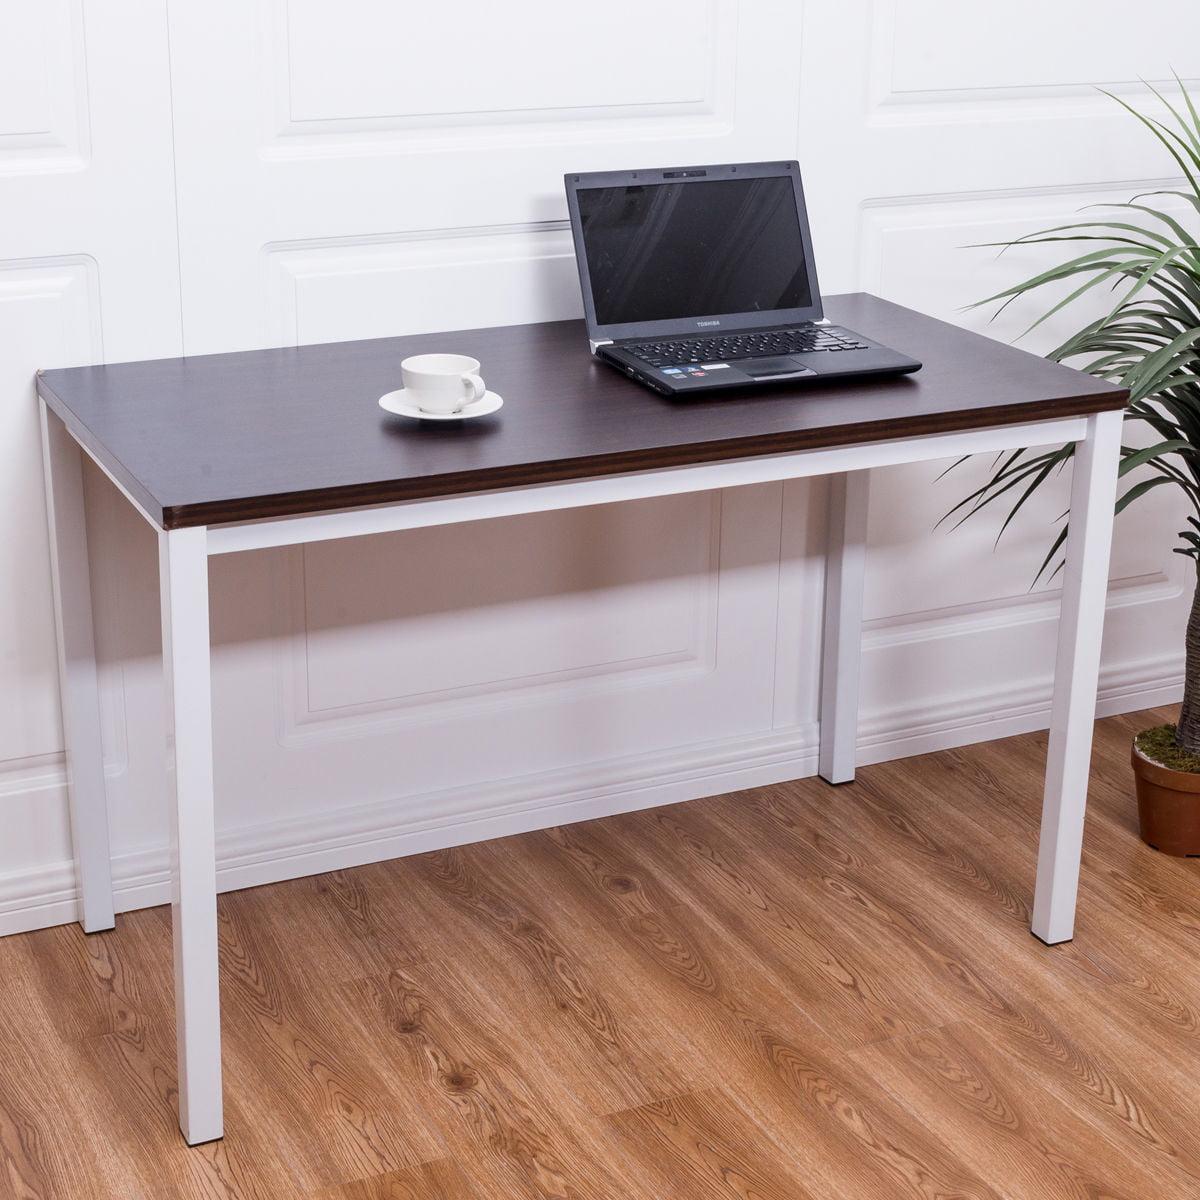 Home office desk computer pc writing table workstation furniture wooden modern walmart com